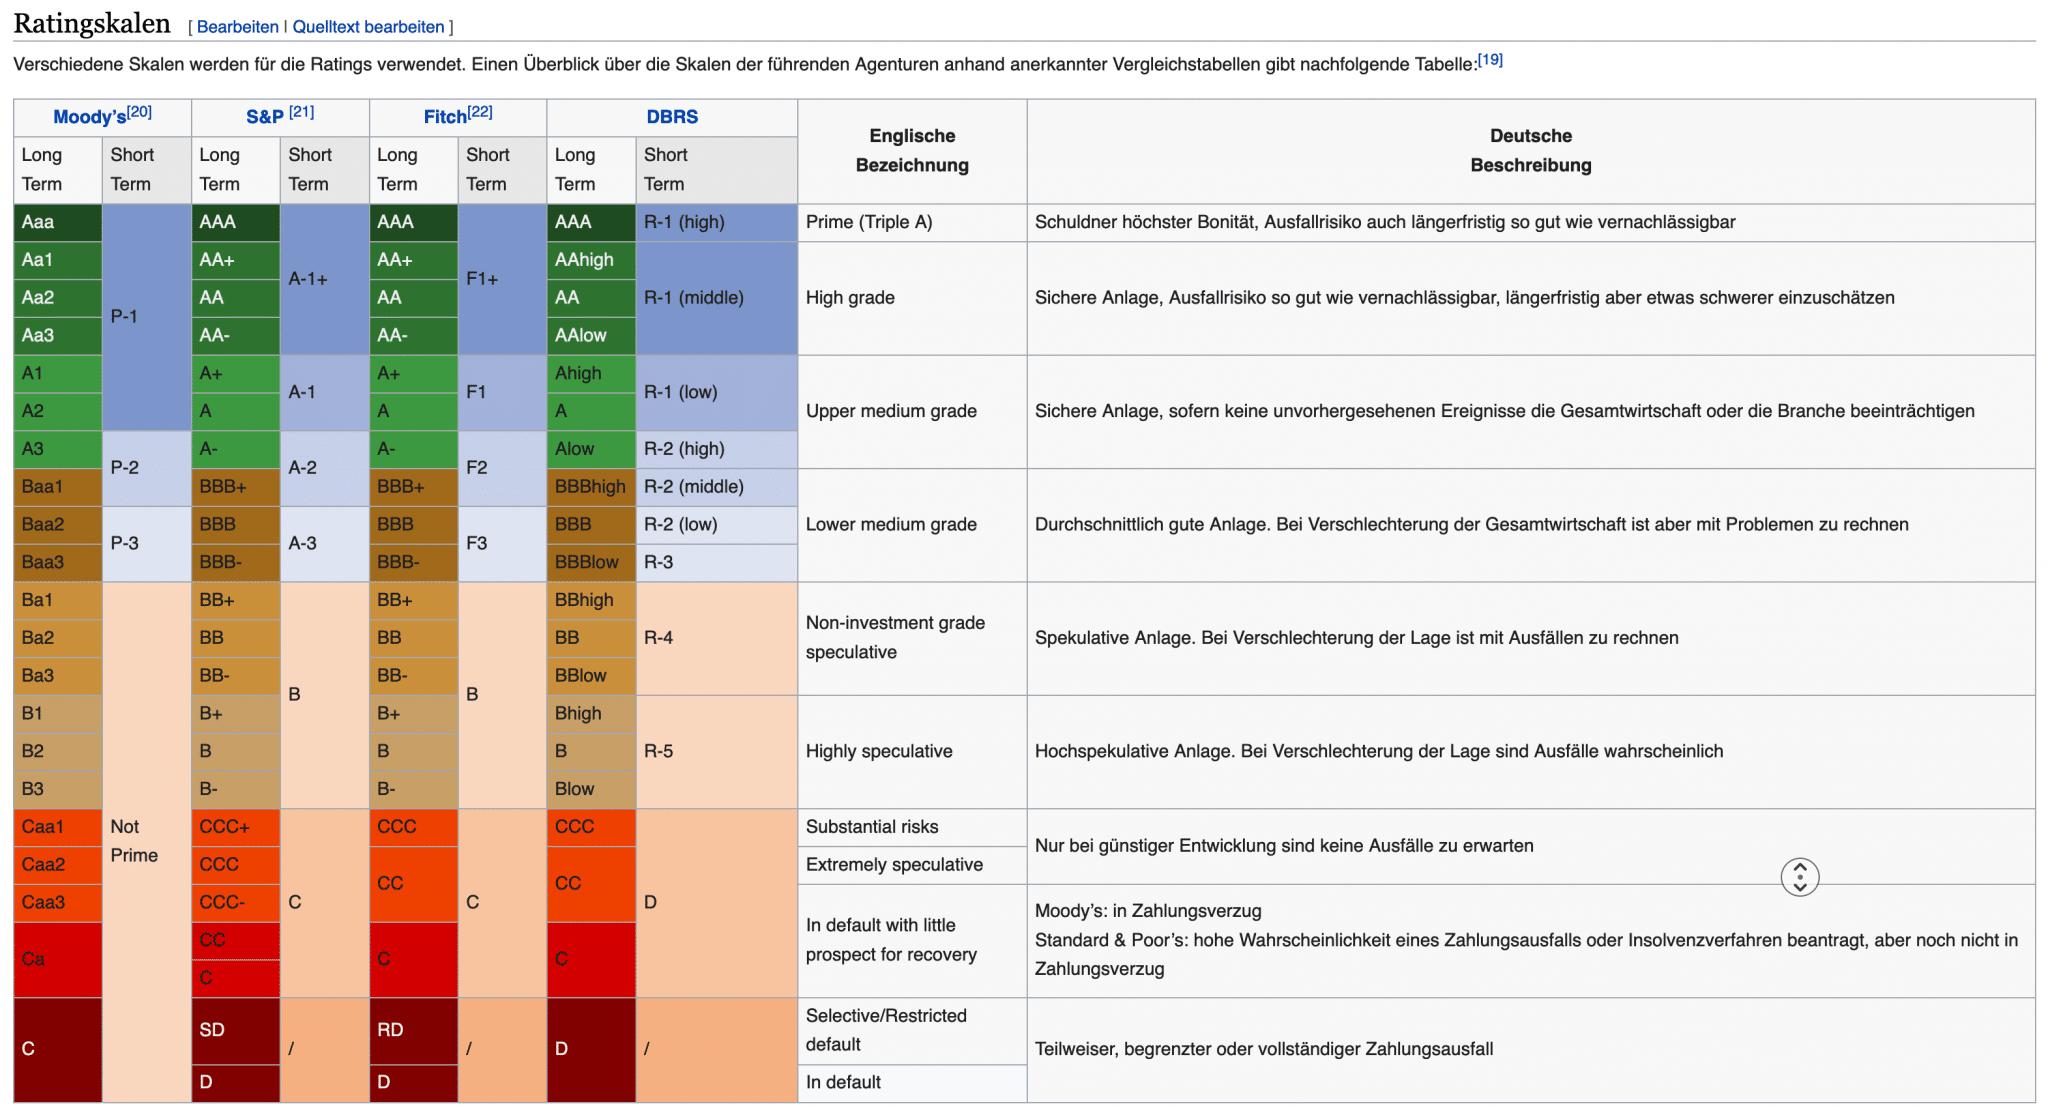 Ratingklassen wikipedia https://de.wikipedia.org/wiki/Rating